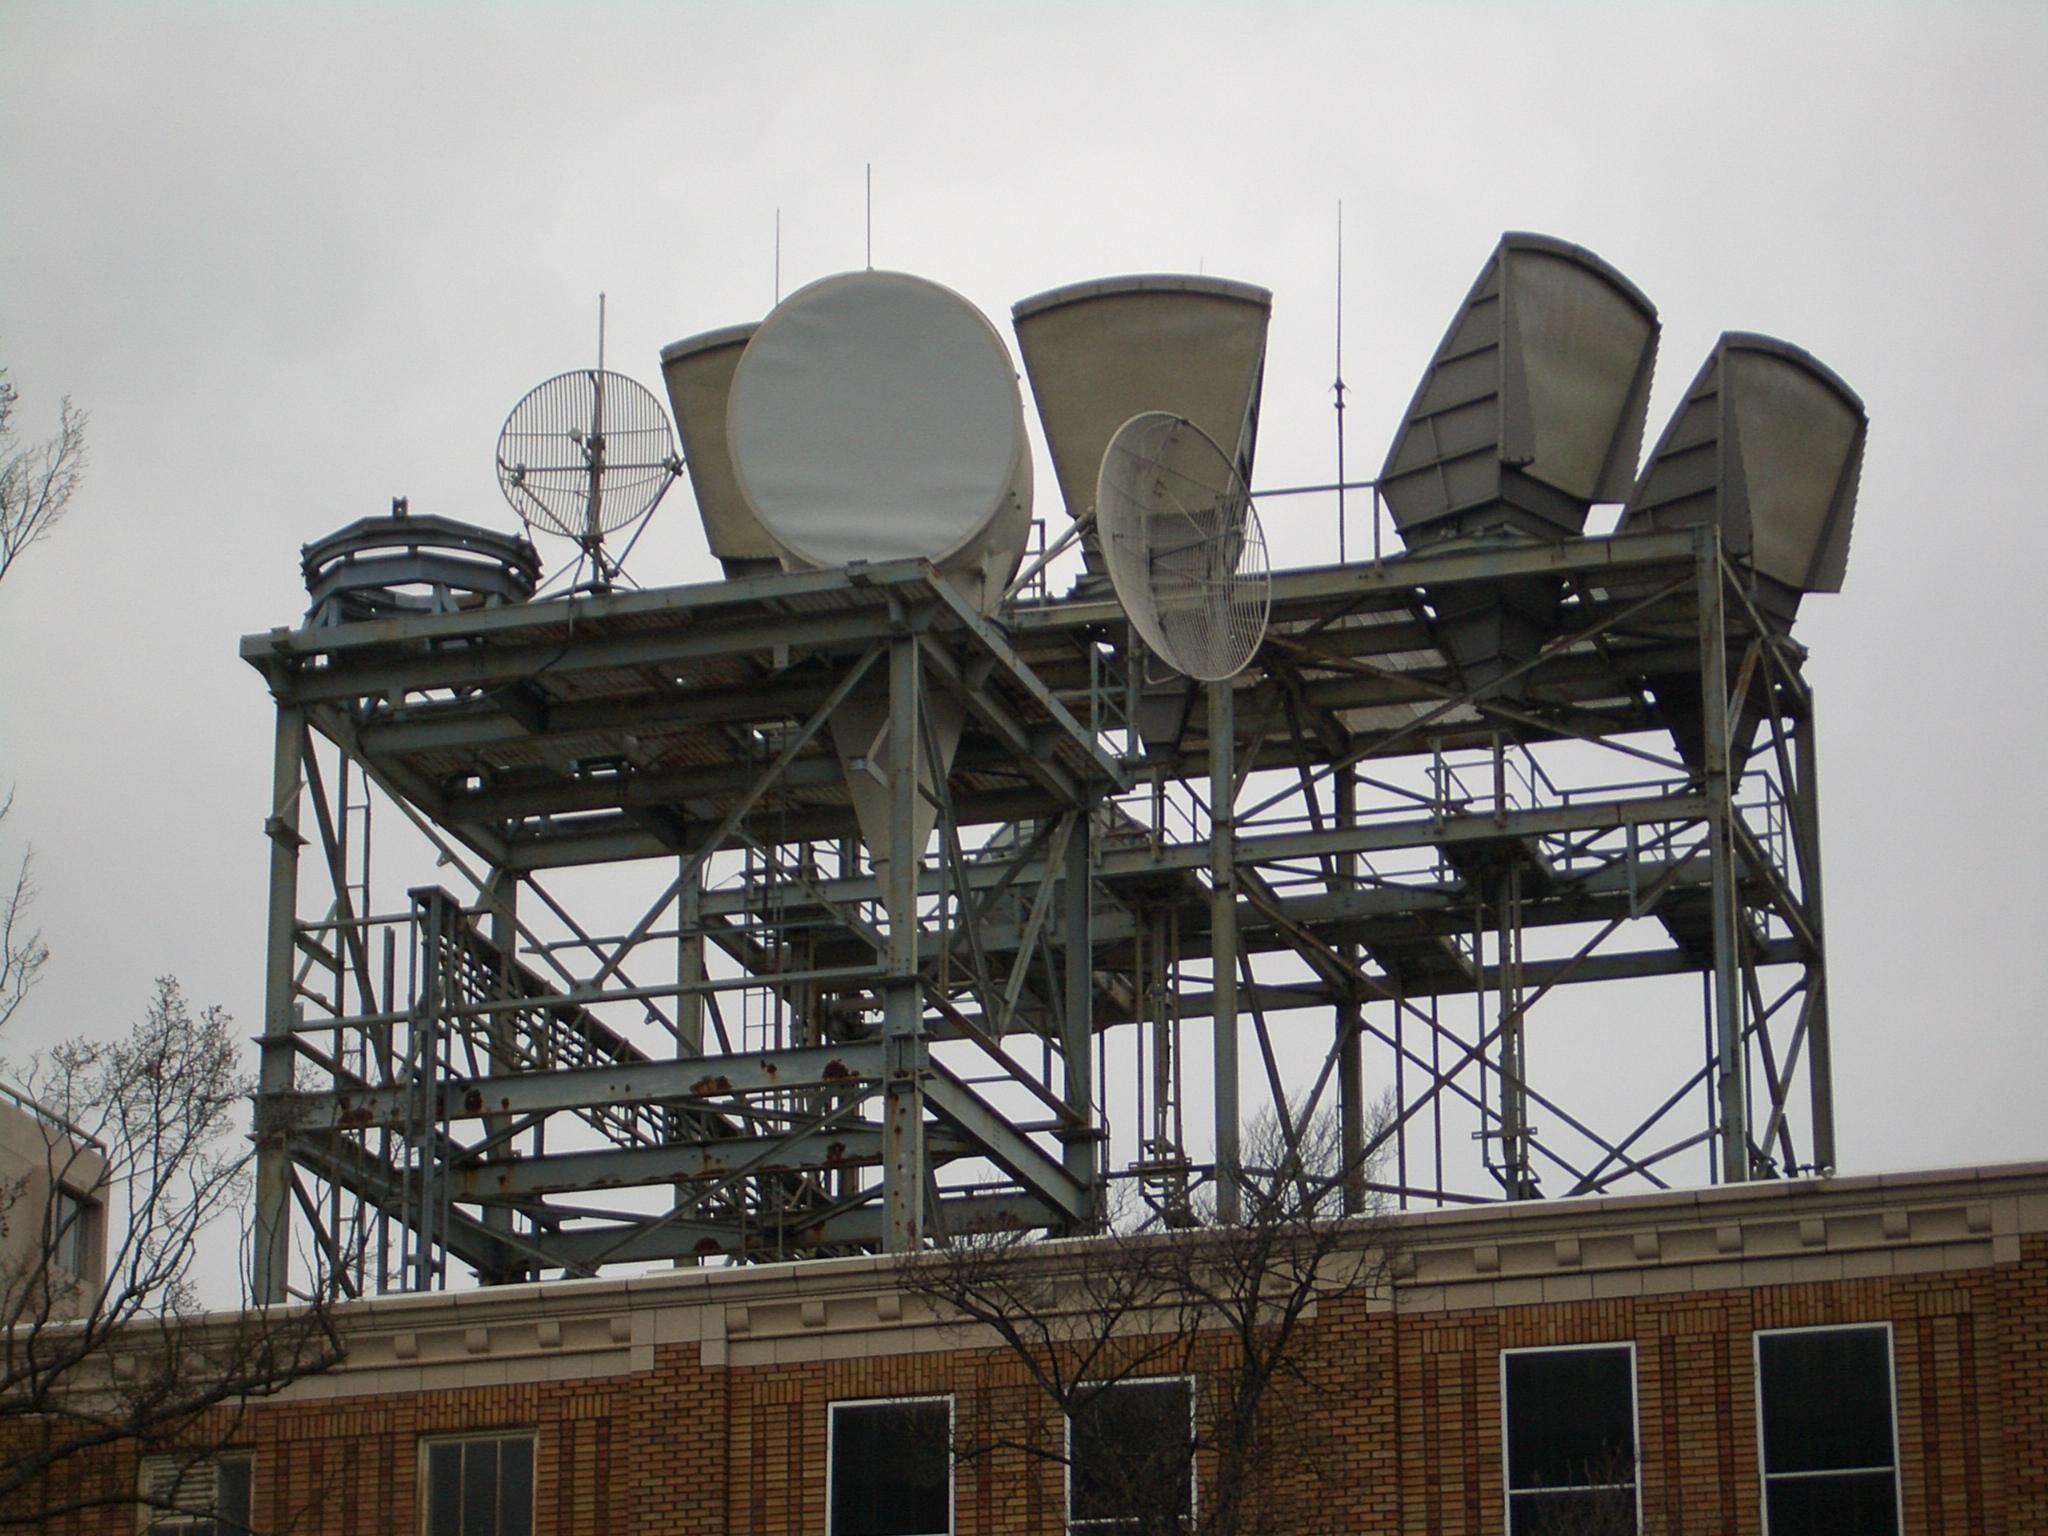 FichierSeattle Capitol Hill Radio Antennas 40.jpg — Wikipédia